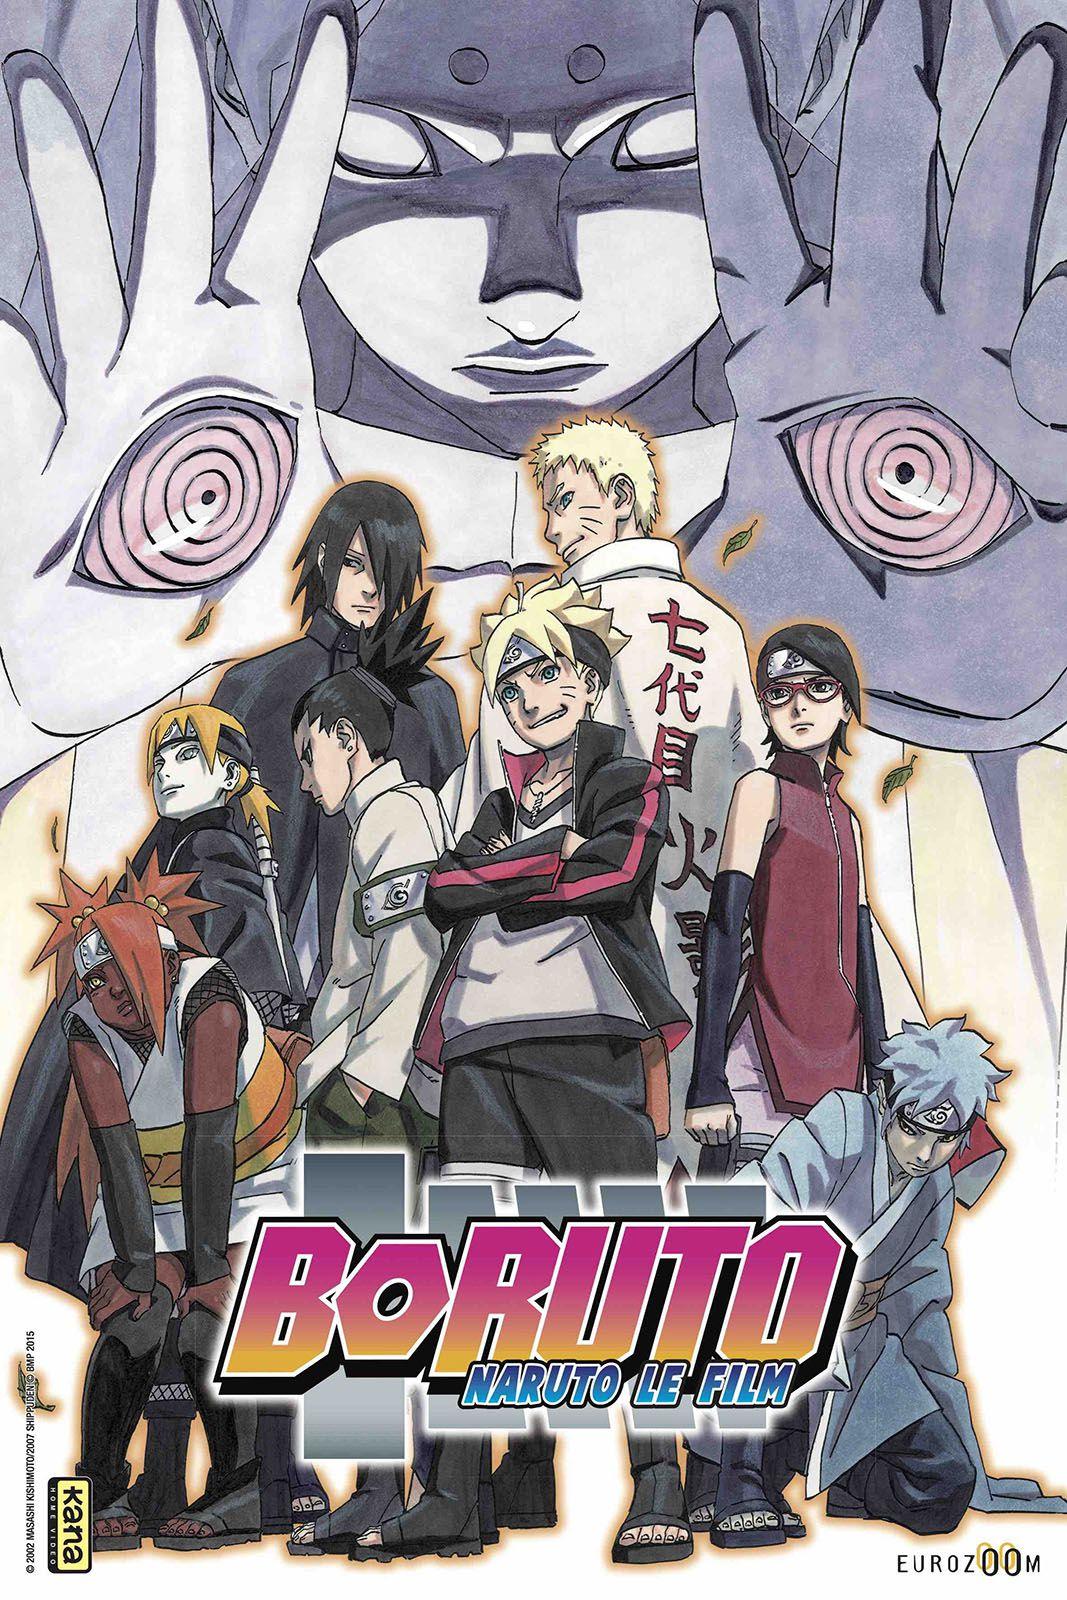 Boruto : Naruto, le film - Long-métrage d'animation (2015)